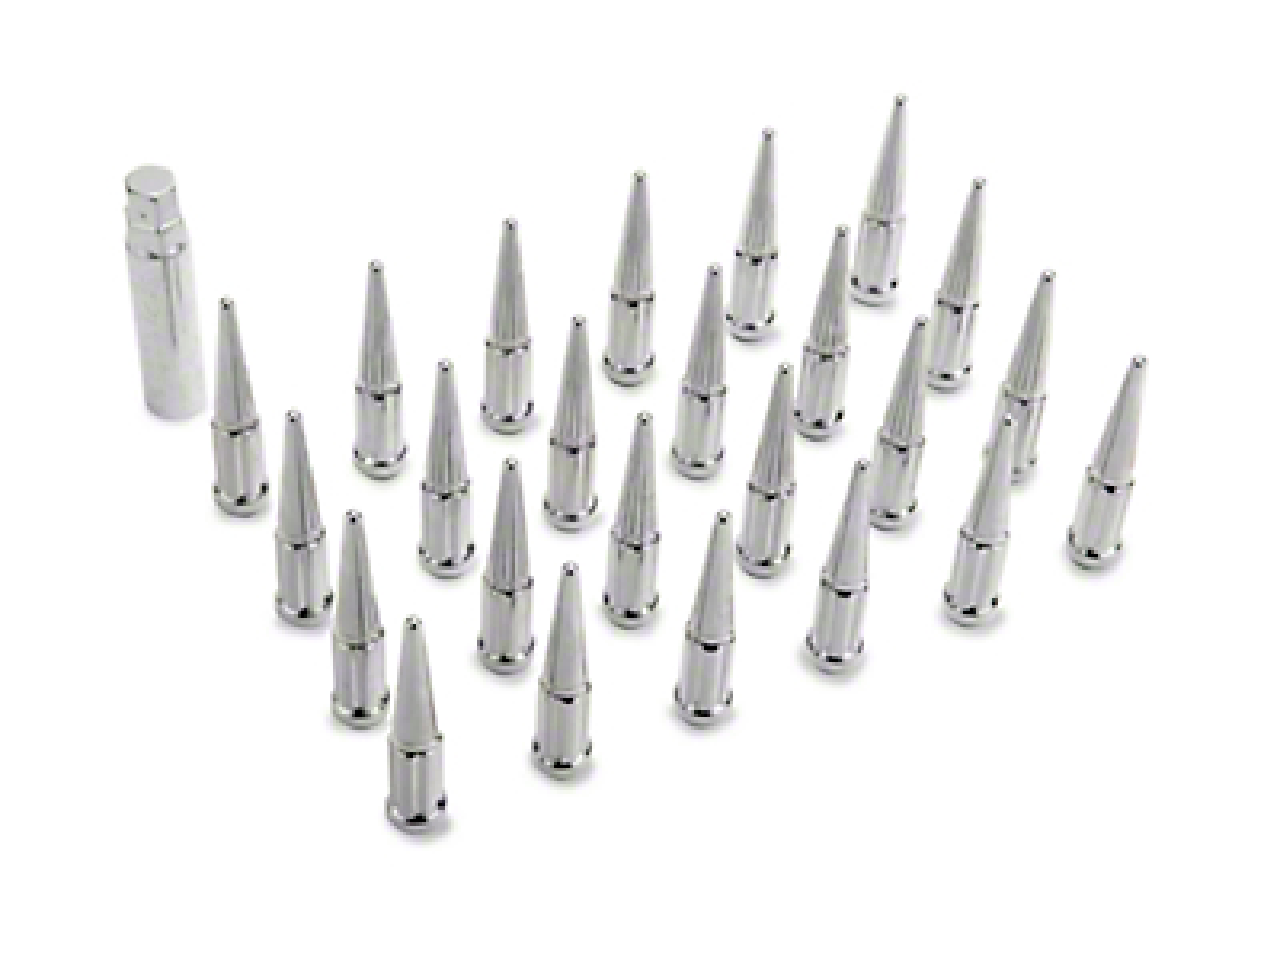 Coyote Chrome Spike Lug Nut Kit - 14mm x 1.5 (99-18 Silverado 1500)